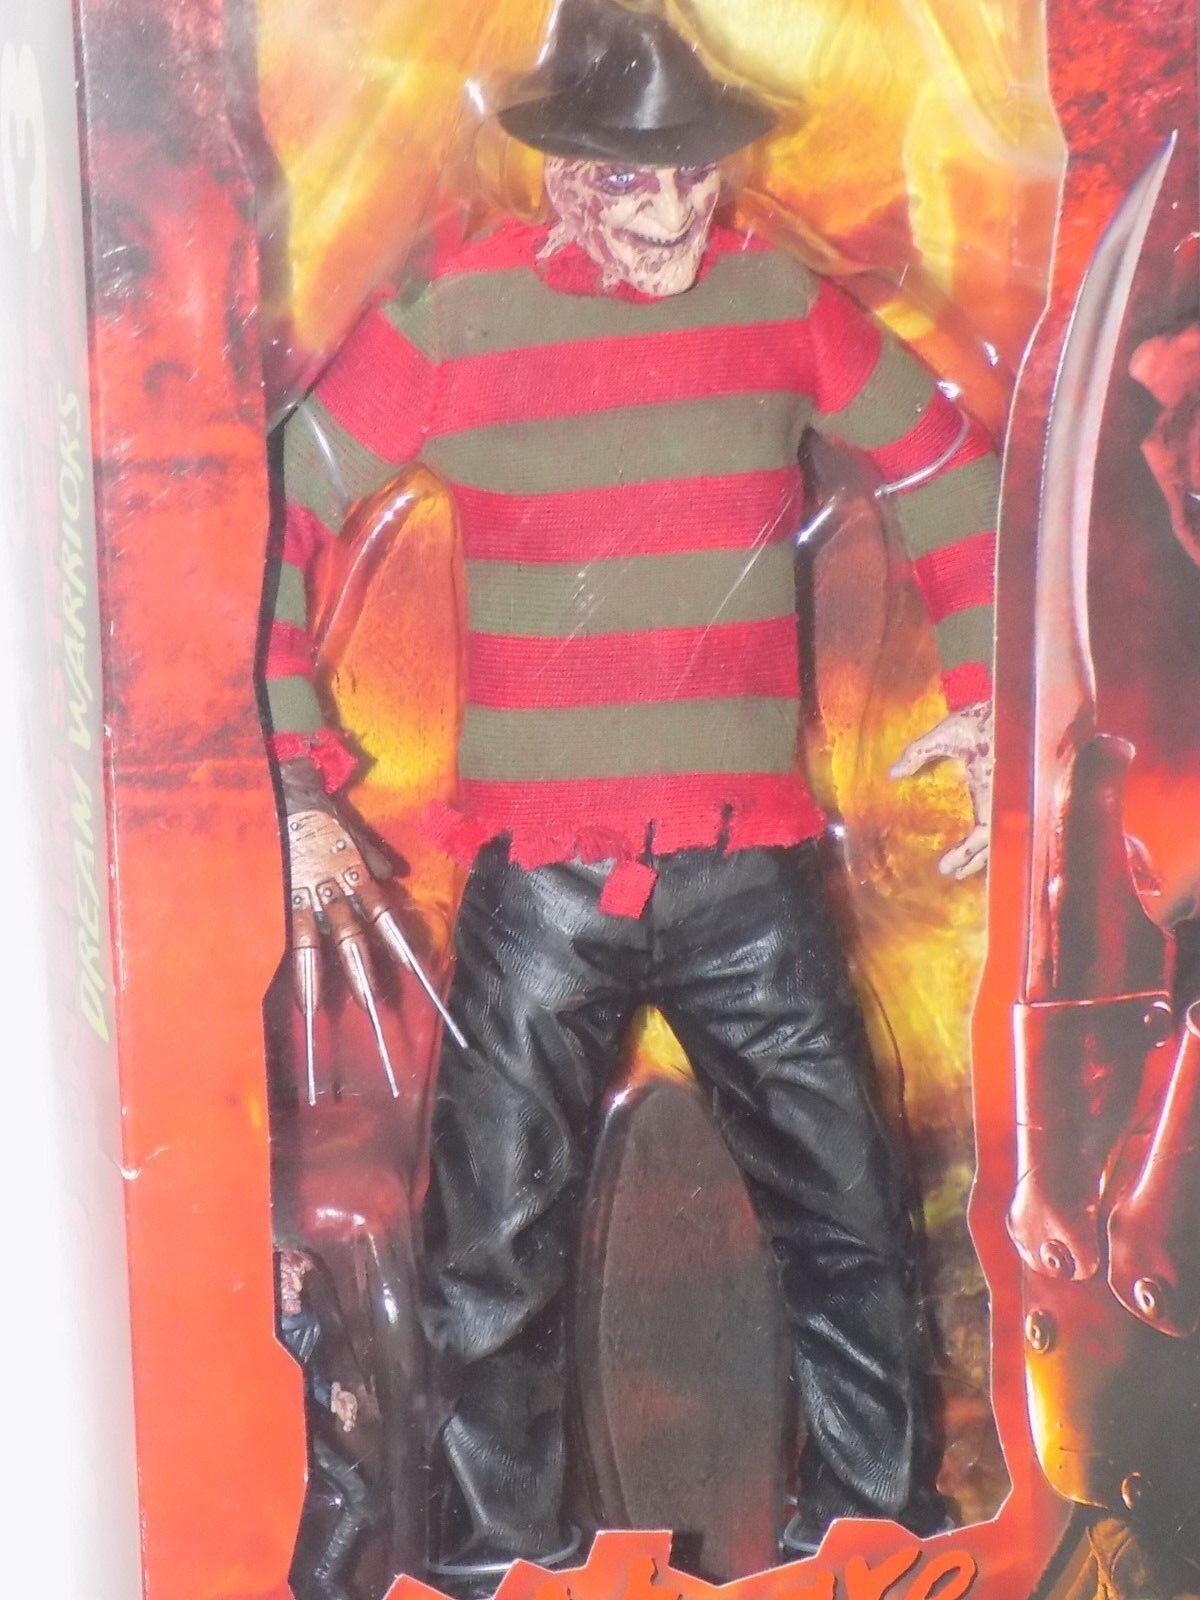 Mezco 12in Frossody Krueger Nightmare Elm st Factory Sealed Deluxe Figure